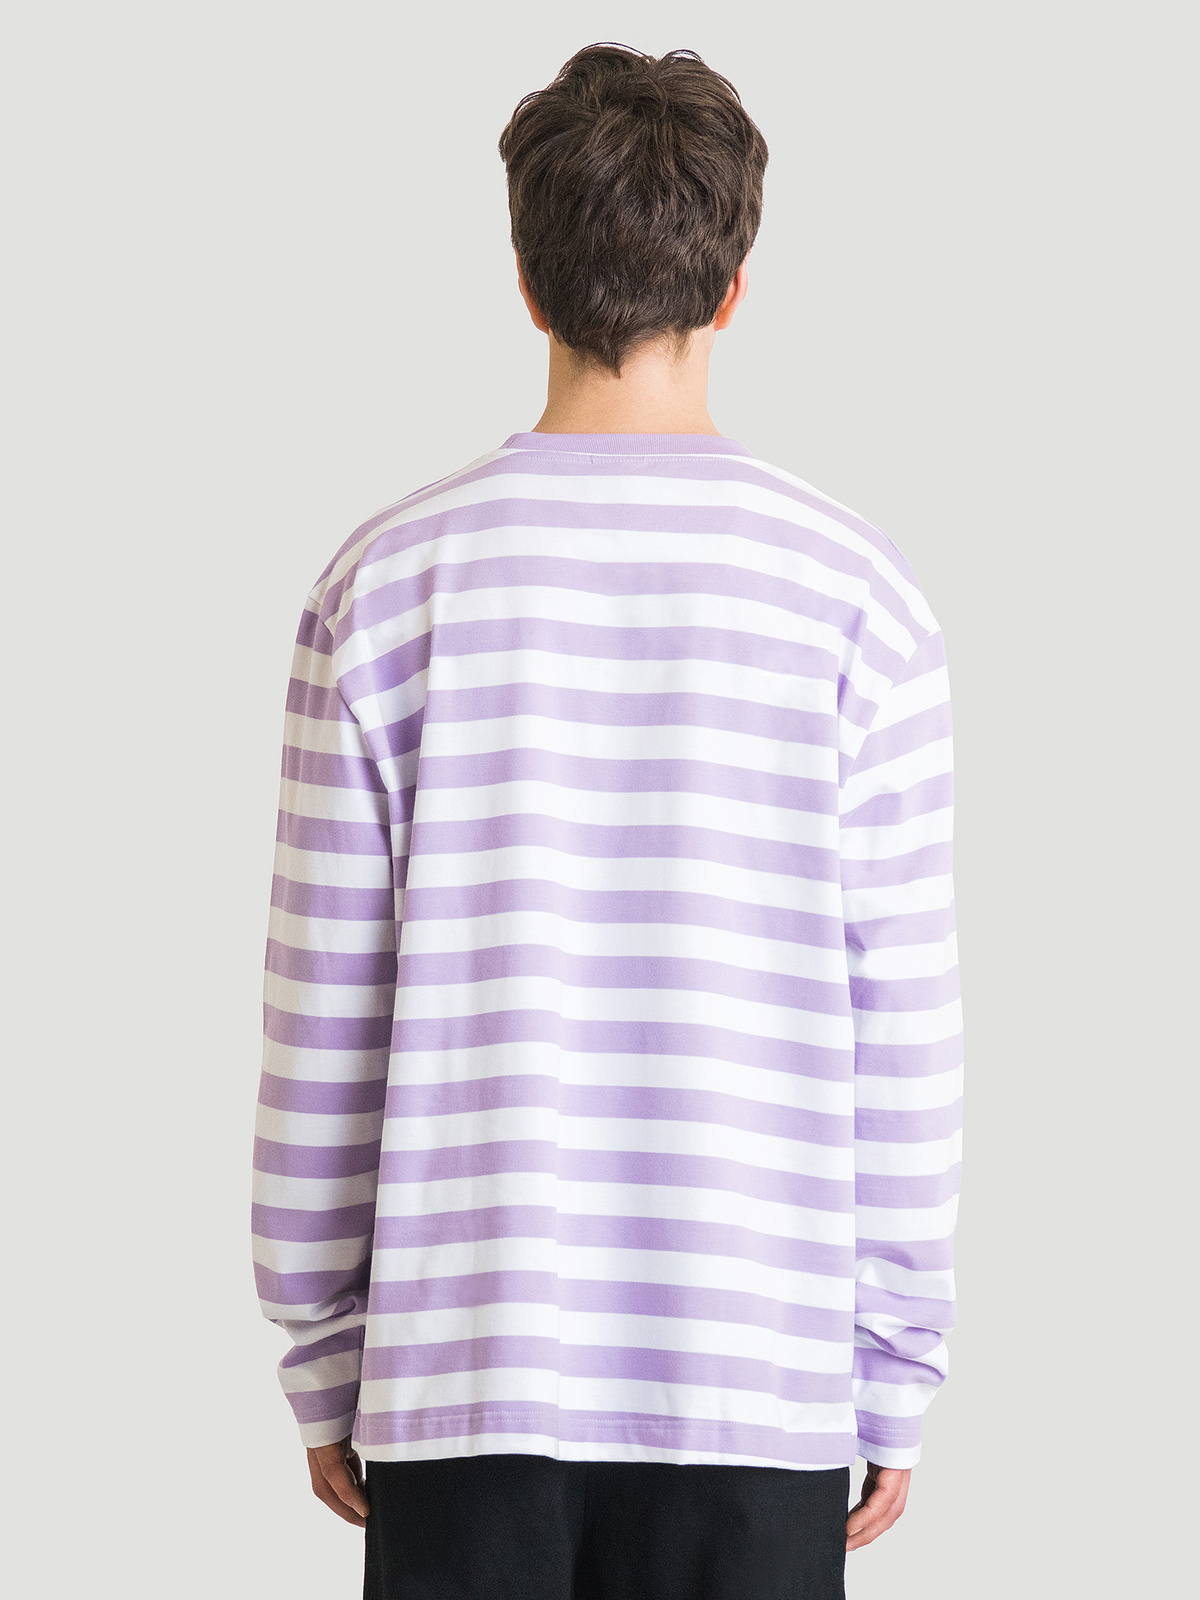 Hanger Striped Longsleeve Lilac White 10